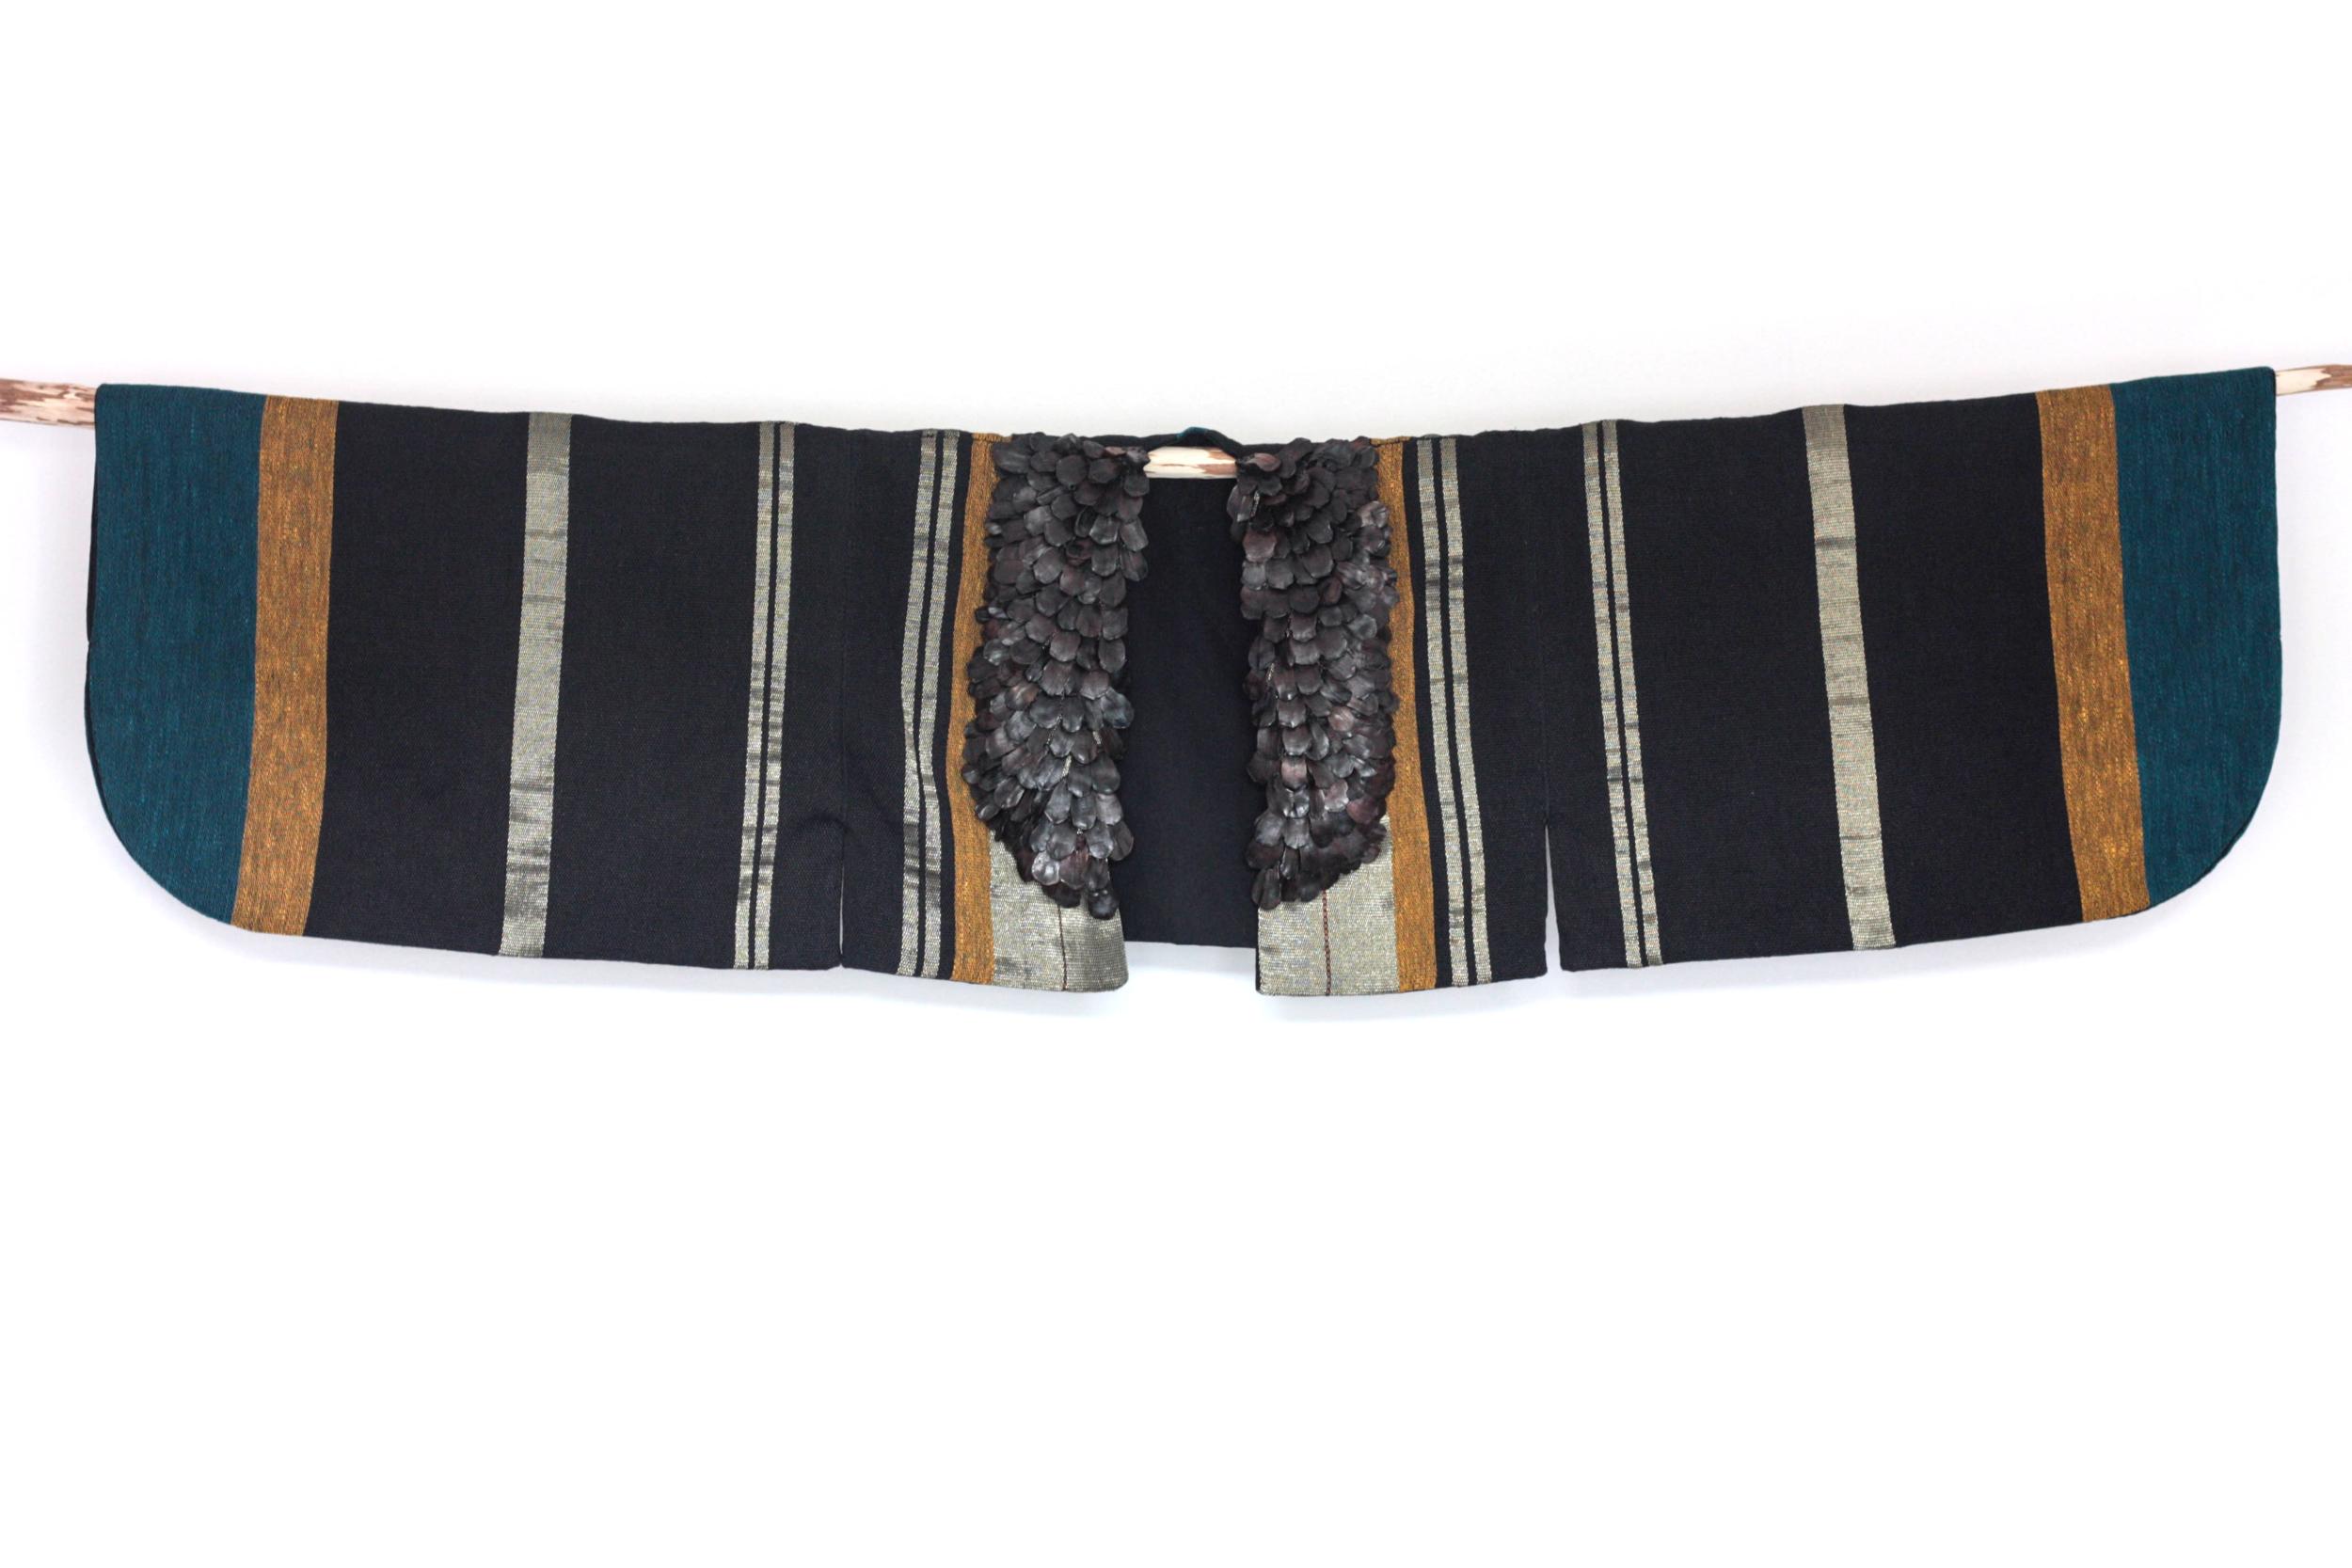 Karine N'guyen Van Tham     En lien  , 2017  Hand-made weaving, sewing, vegetable scales embroidery  Linen, real gold wire, cotton, pine cones  37 cm x 150 cm